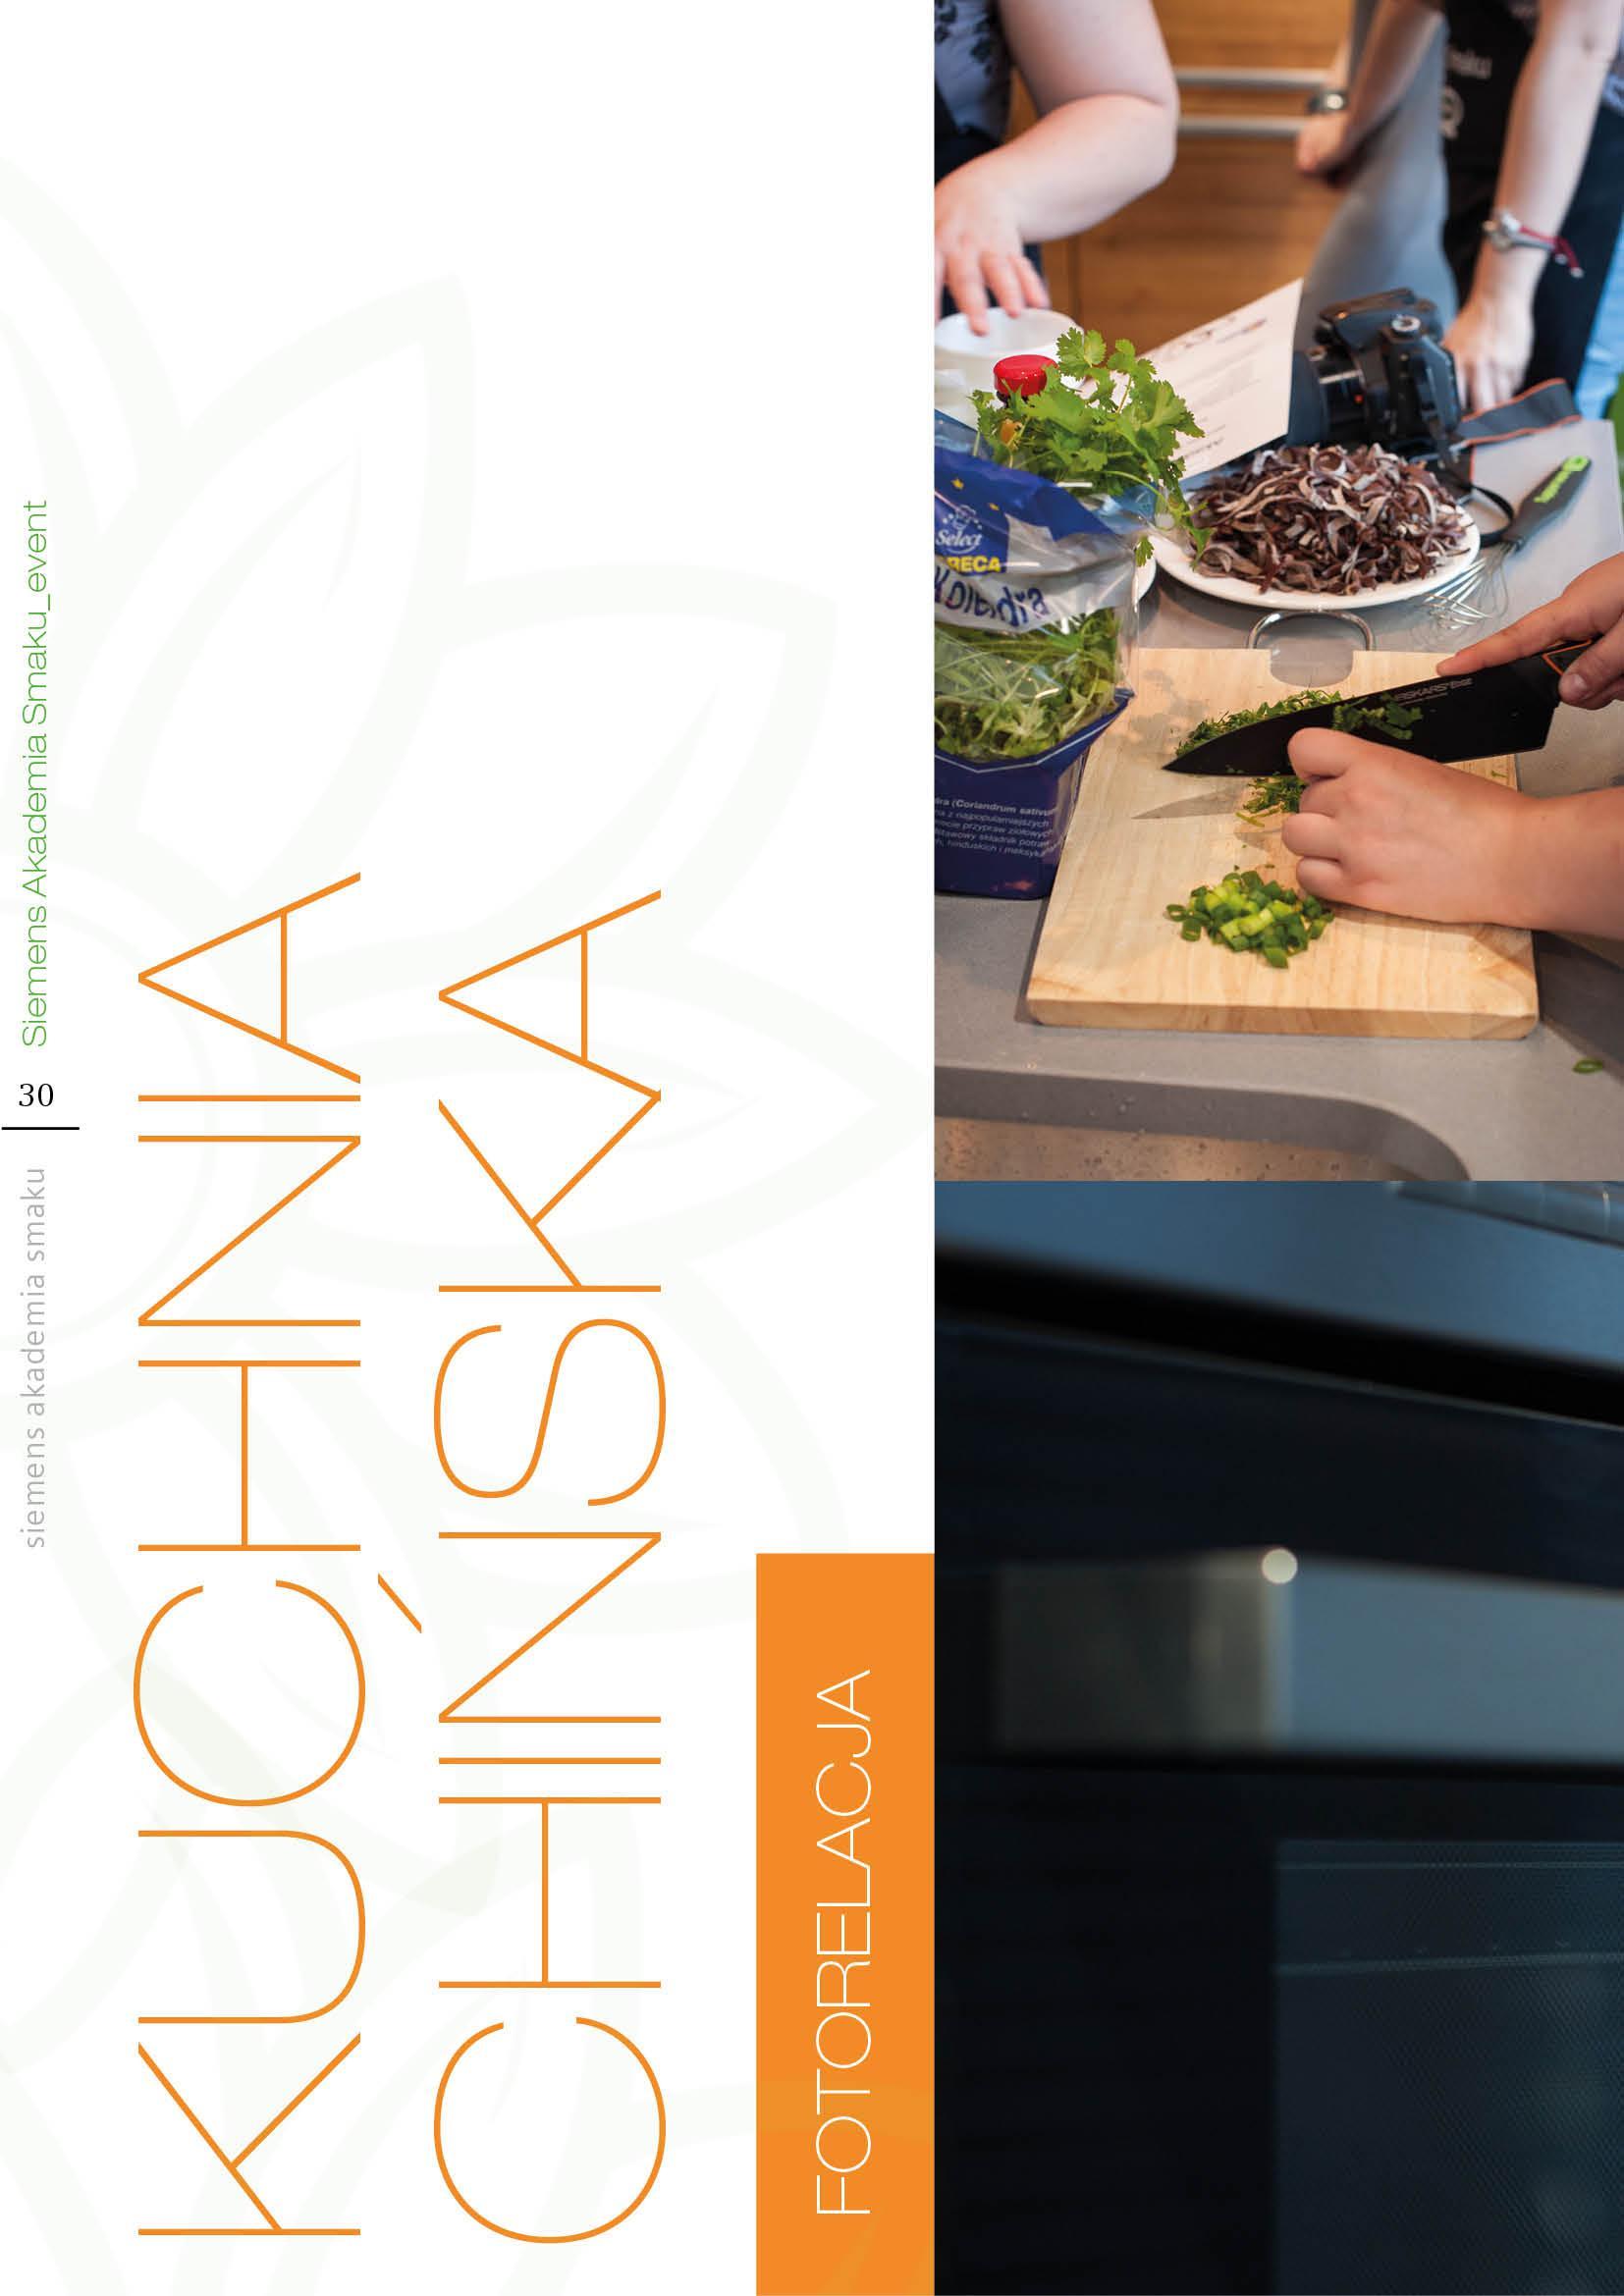 Kuchnia chińska - Strona 30